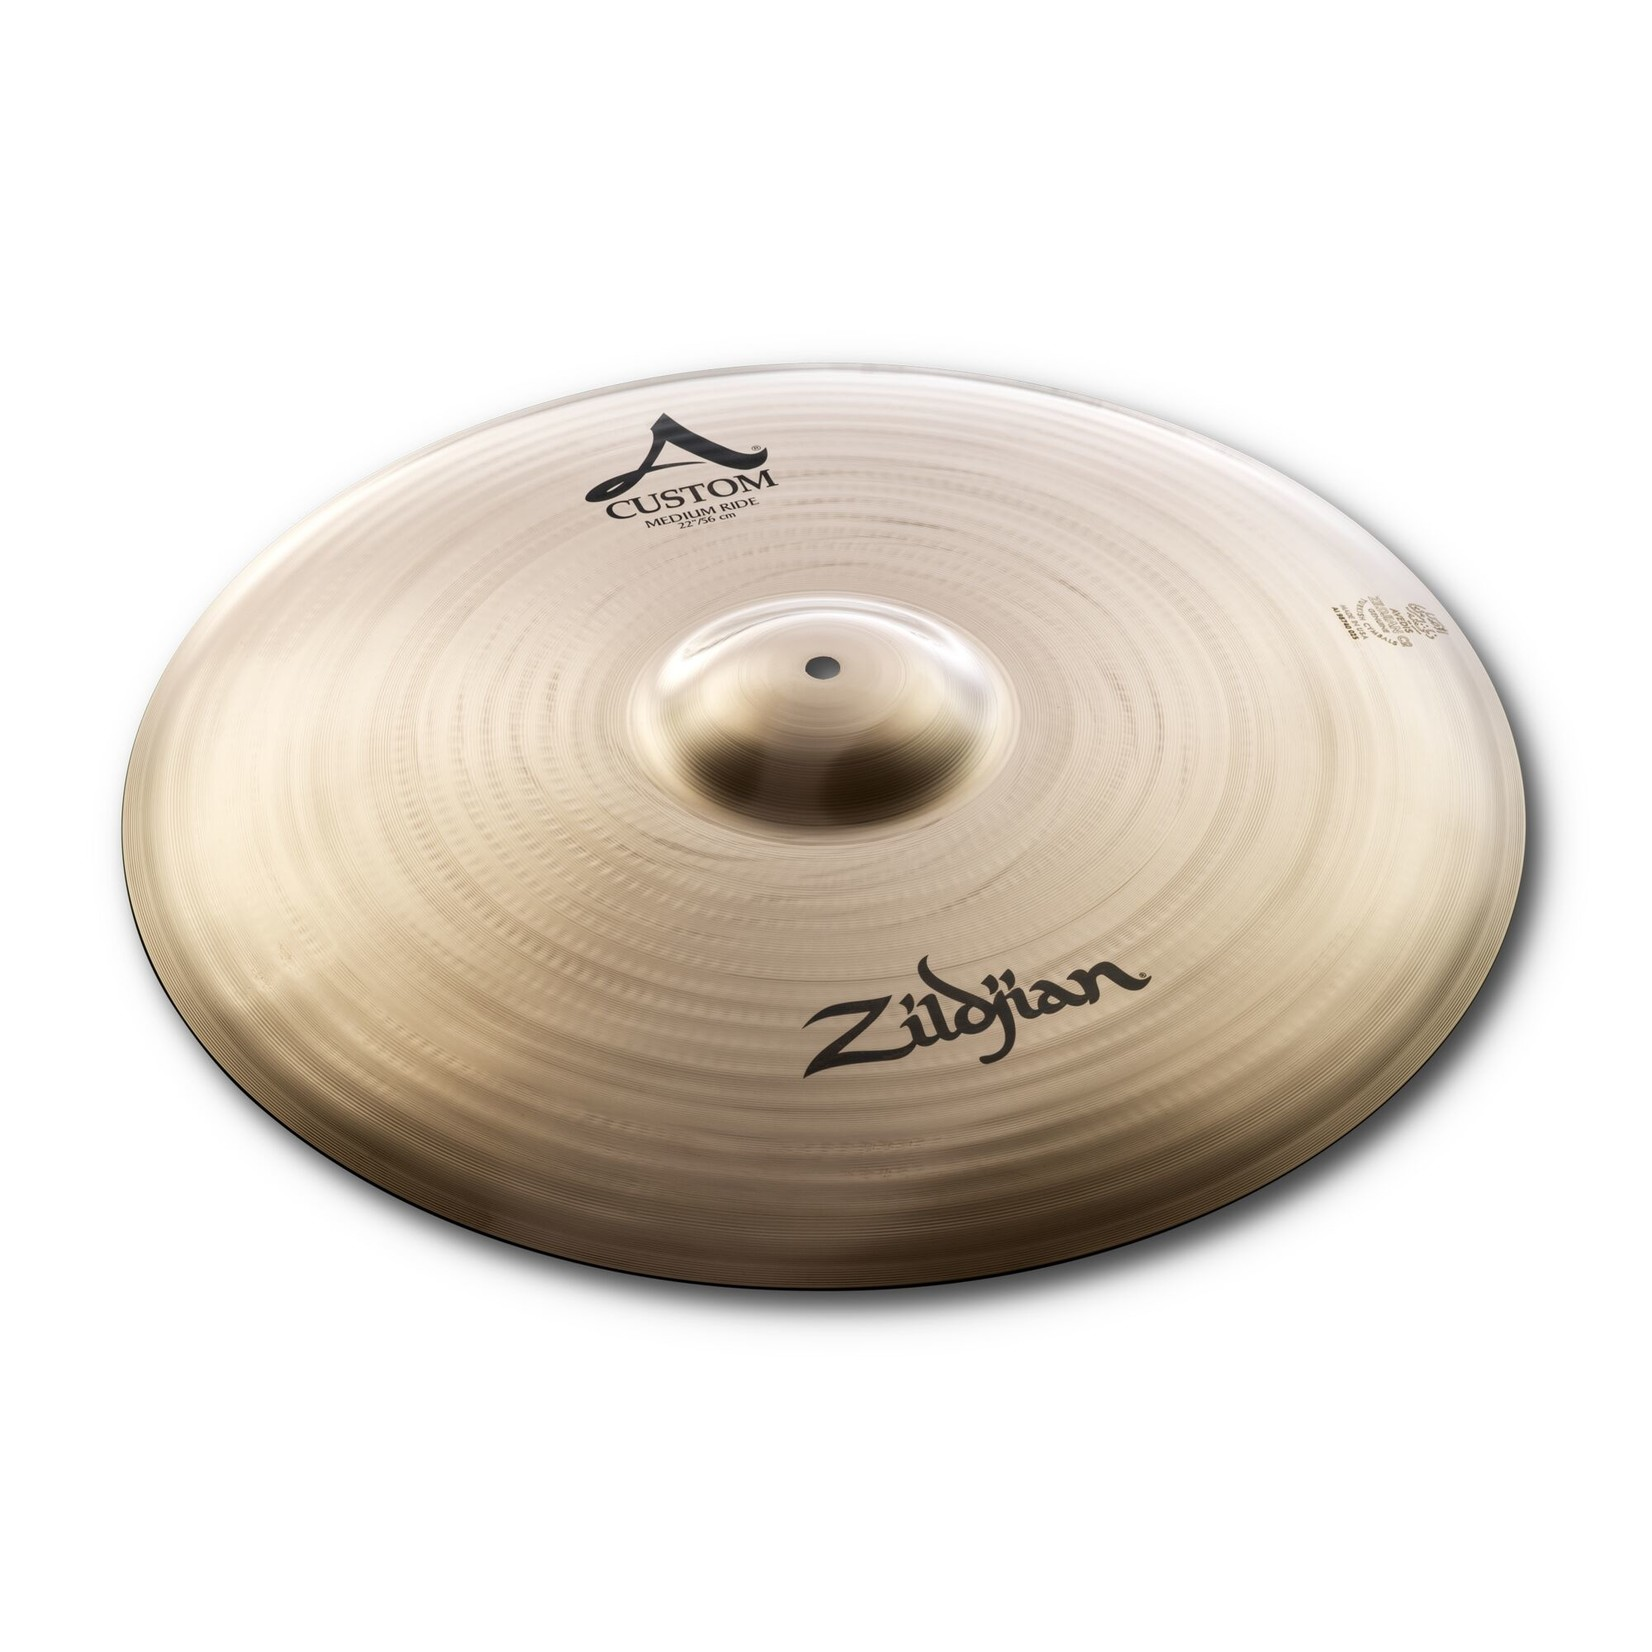 "Zildjian Zildjian 22"" A Custom Medium Ride"